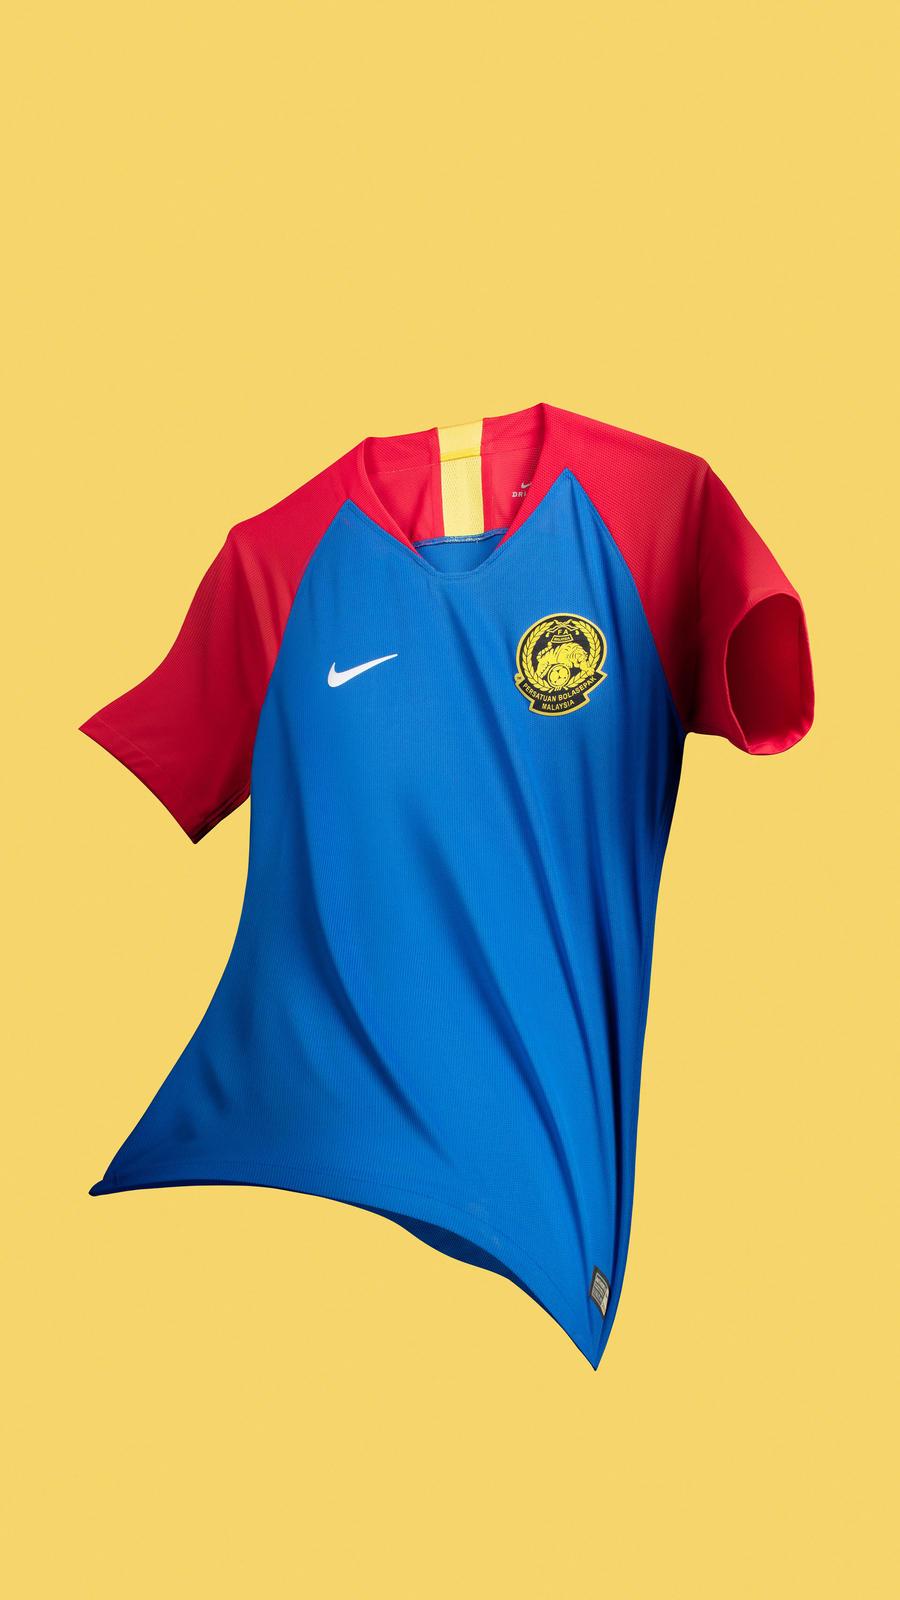 e82de4aa0 Malaysia 2018 2019 2020 Nike Home and Away Football Kit, Soccer Jersey,  Shirt,